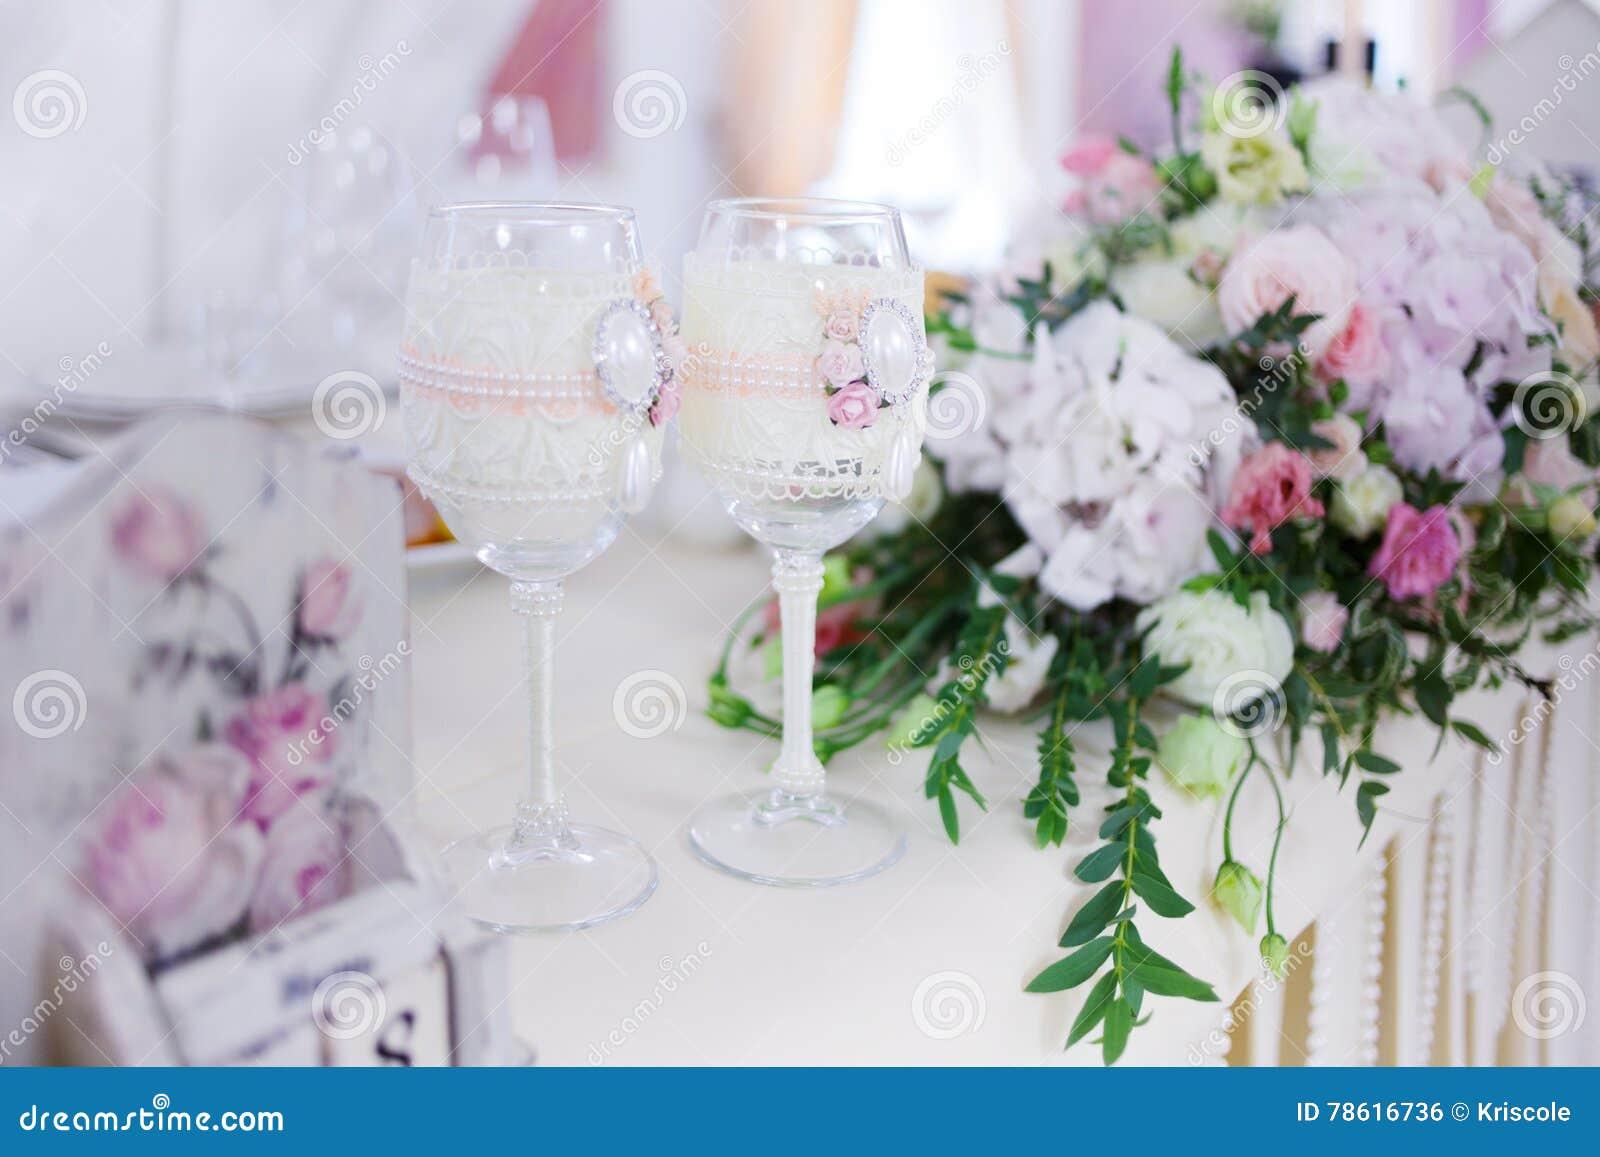 Beautiful Glasses Of Champagne And Wine, Wedding Decor, Celebration ...